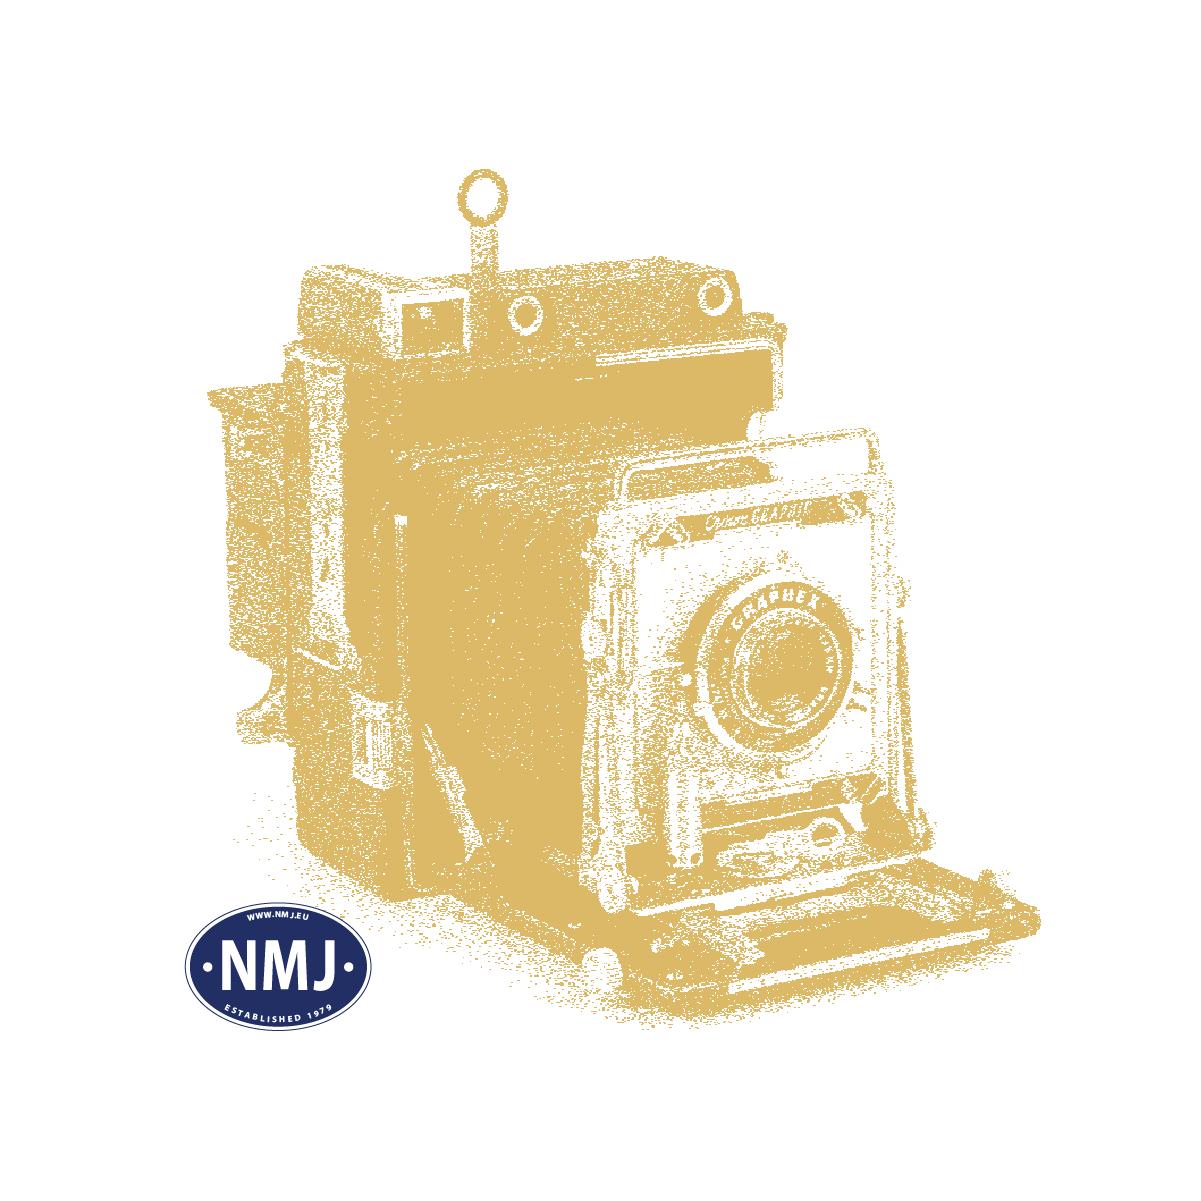 NOC36082 - Trafikkpoliti, 6 Stk, N-Skala